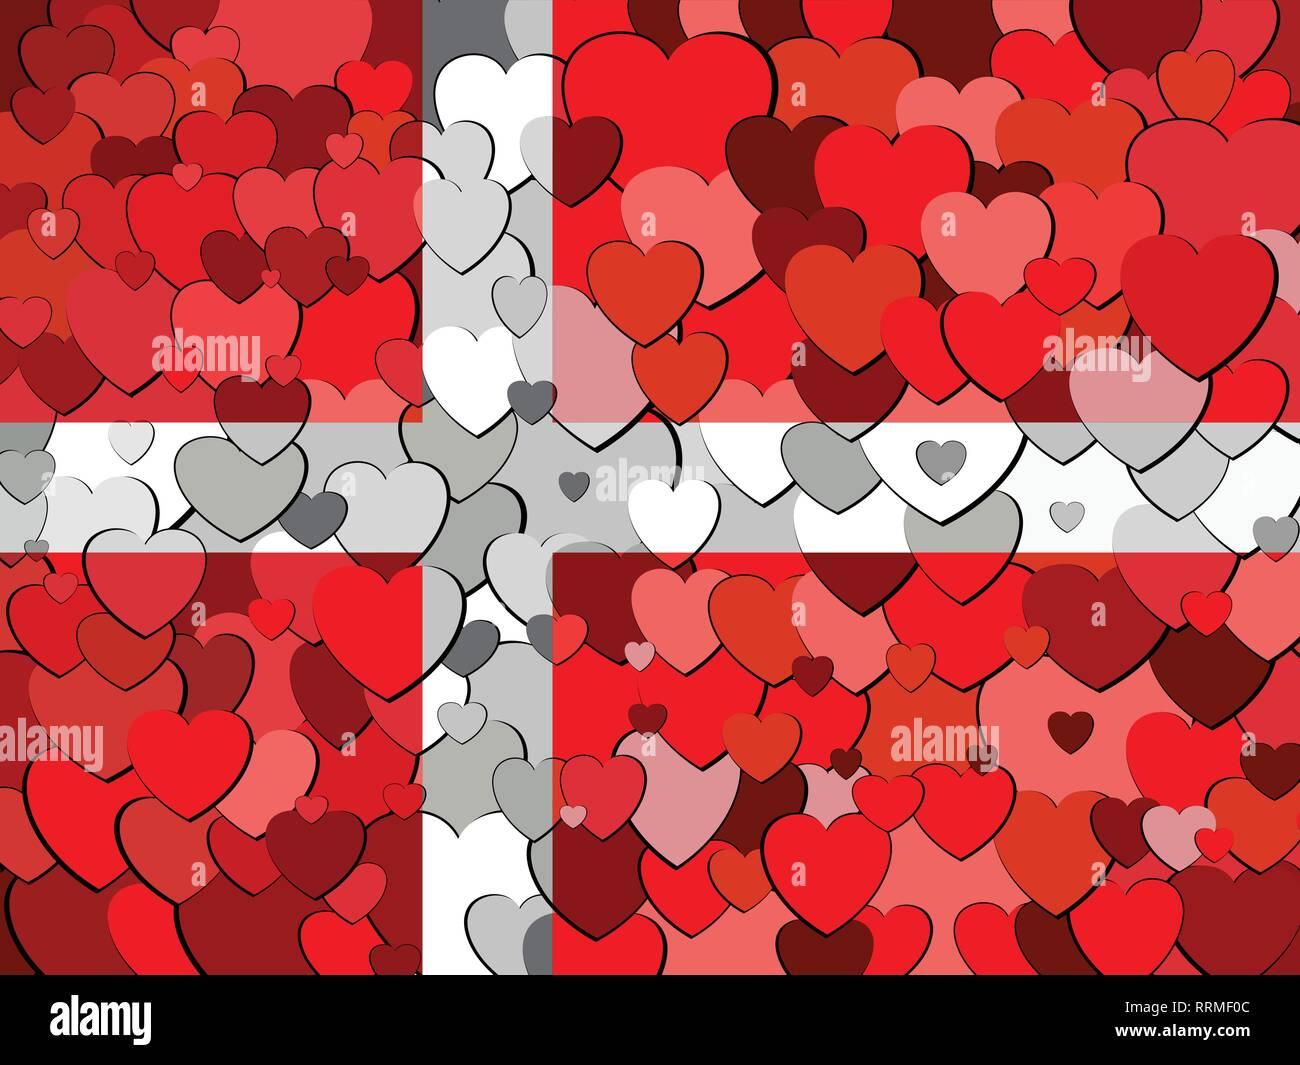 Denmark flag made of hearts background - Illustration - Stock Vector